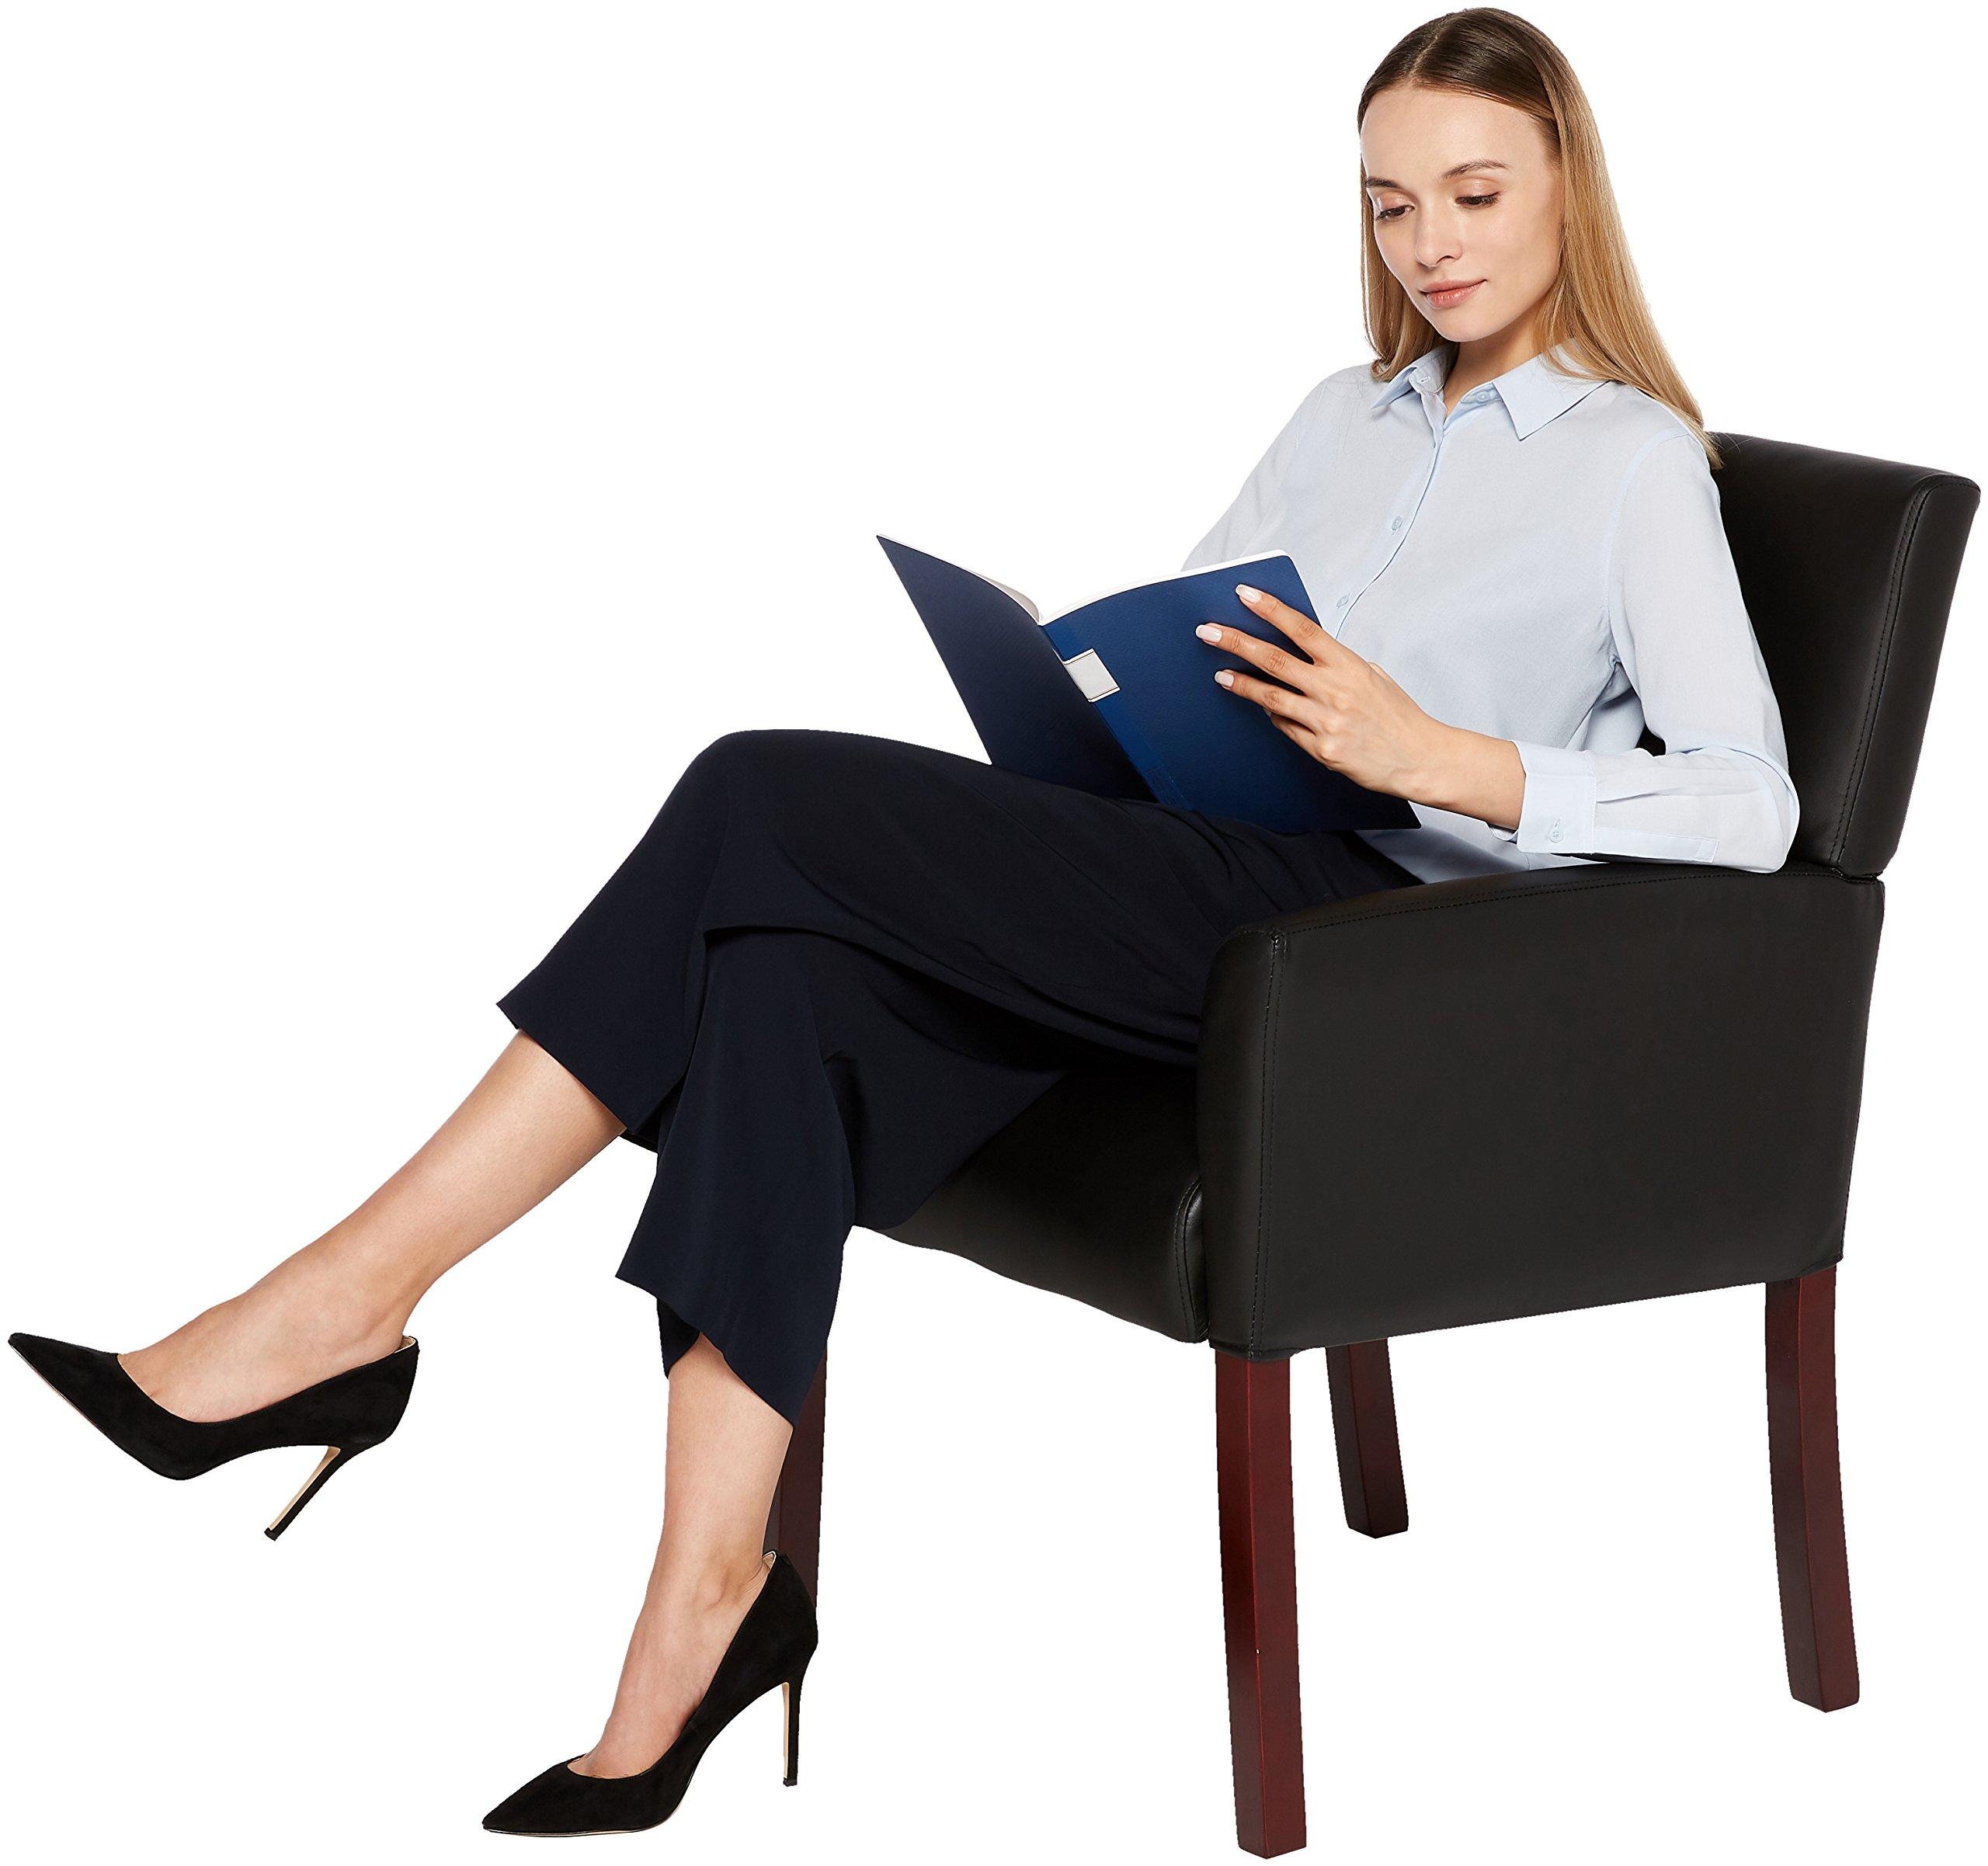 AmazonBasics Reception Chair, Black by AmazonBasics (Image #2)